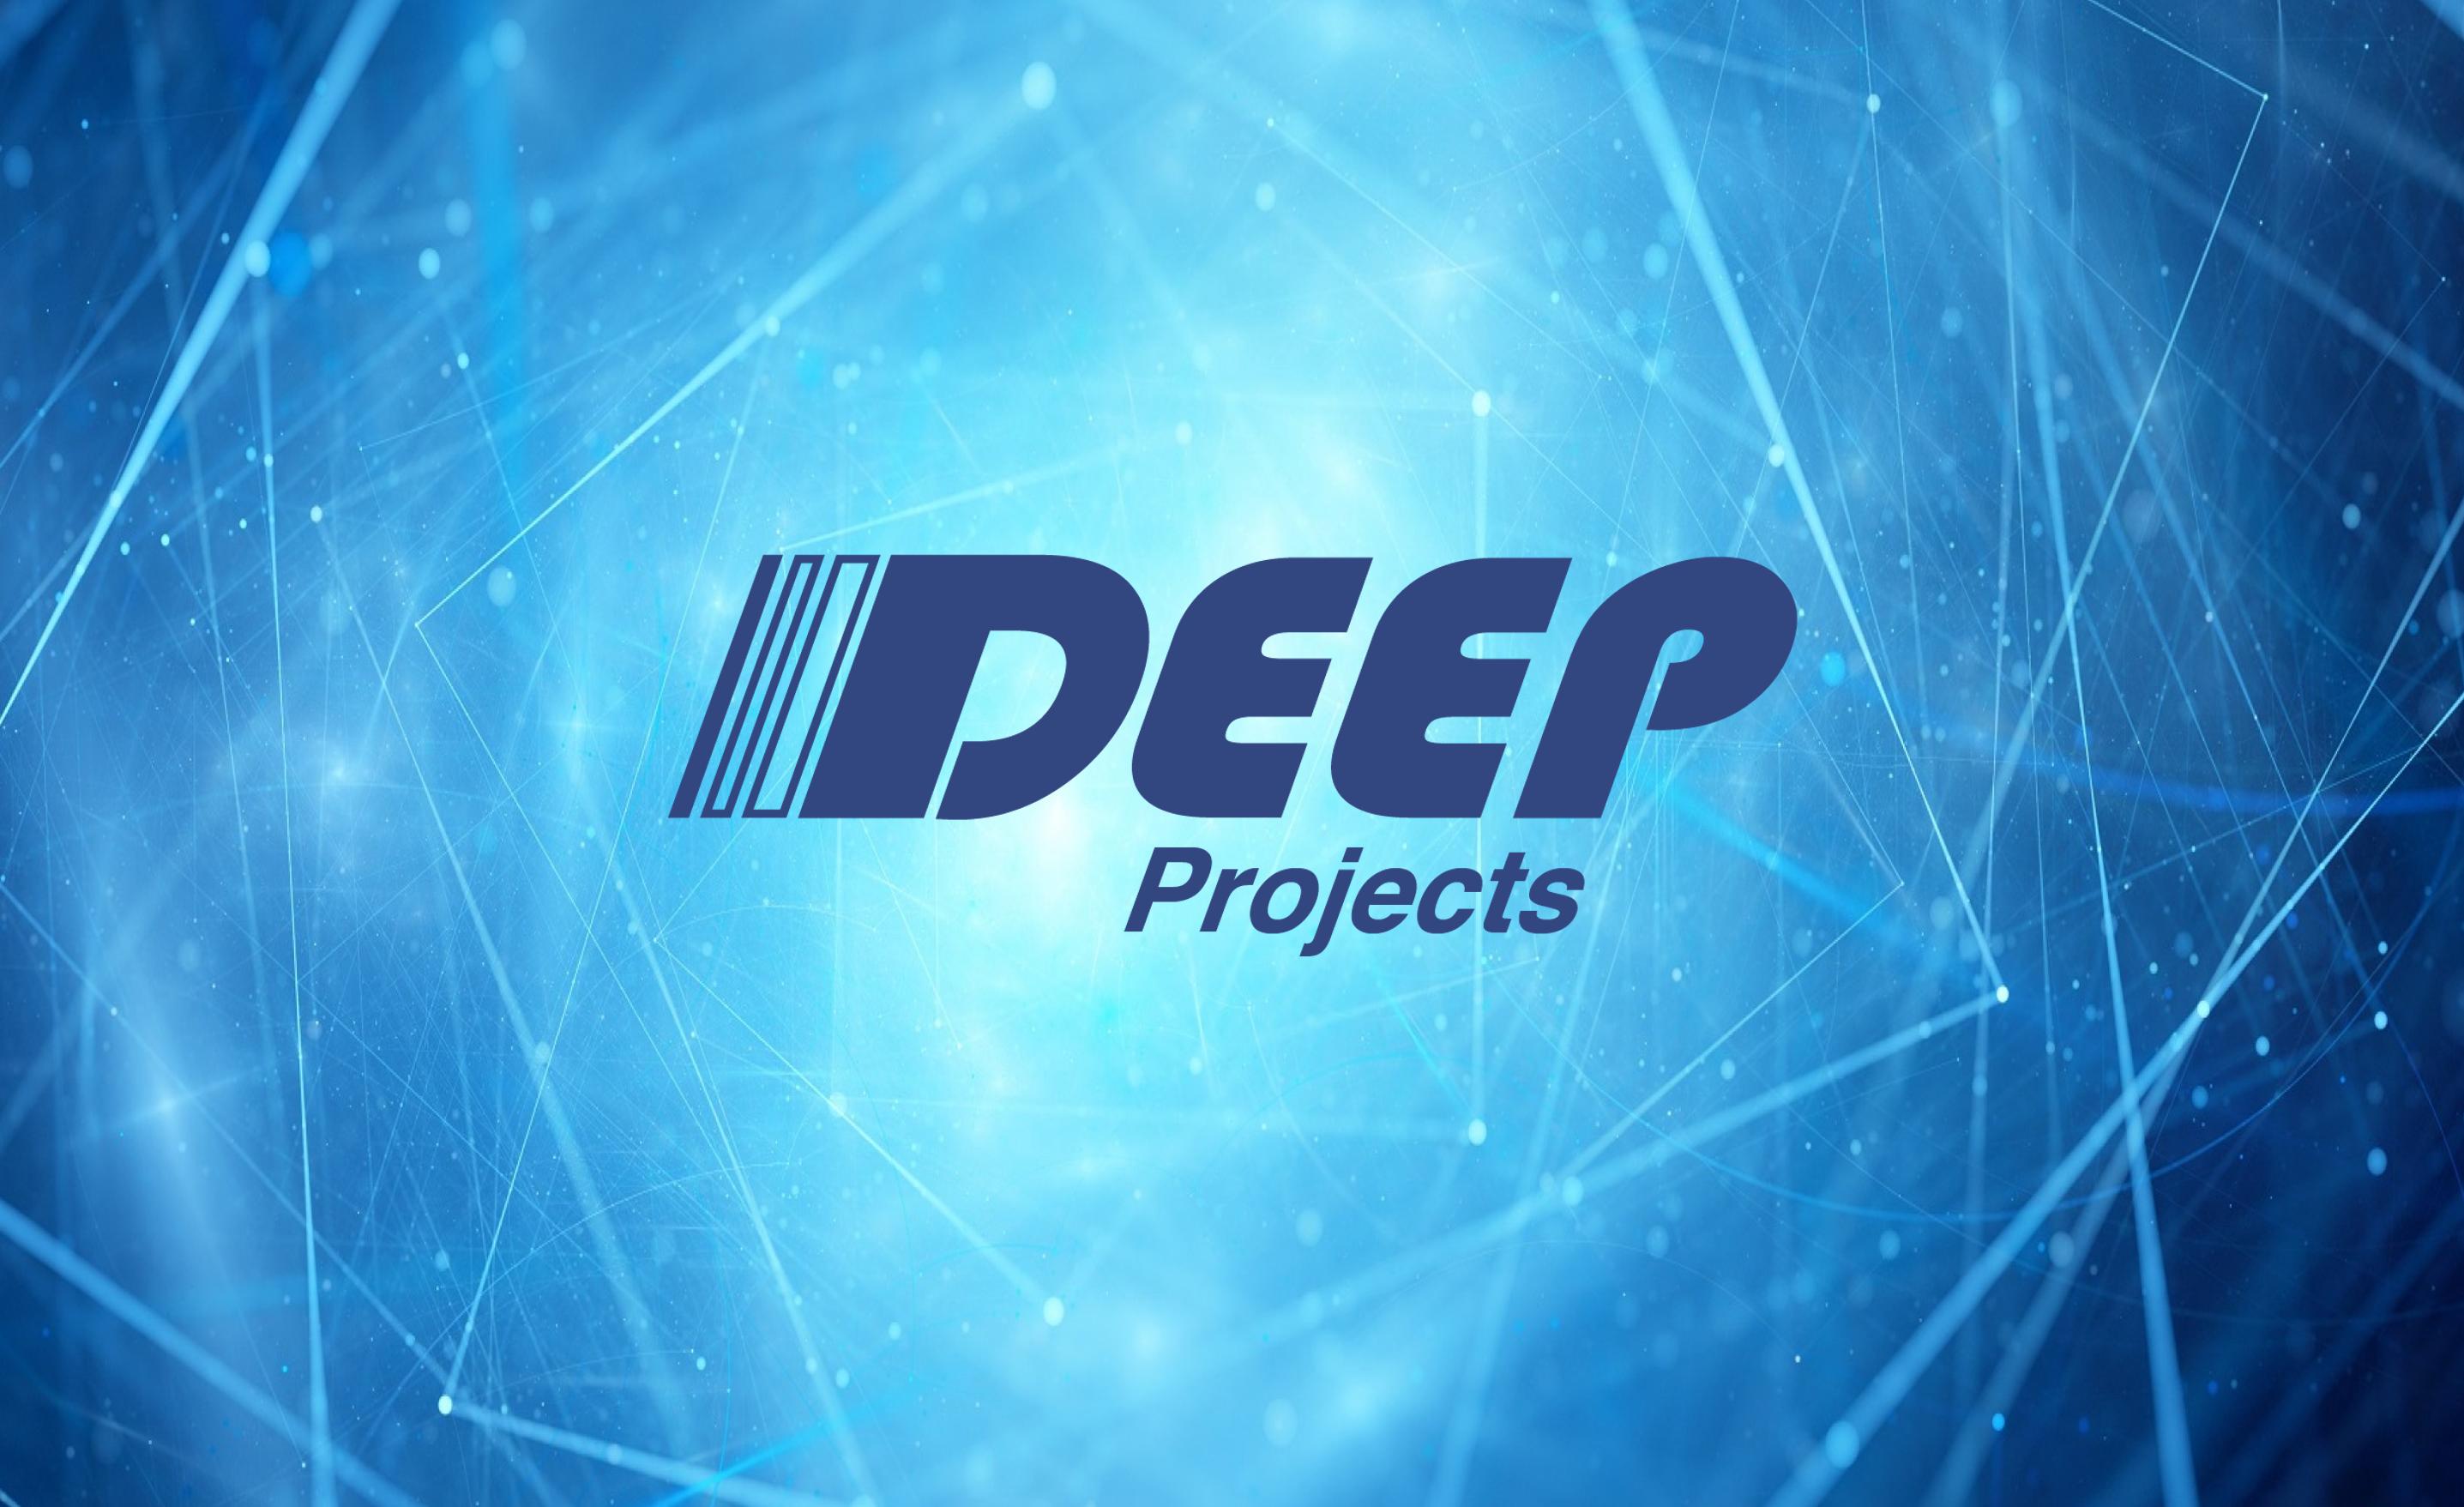 Morris Riedel DEEP Projects